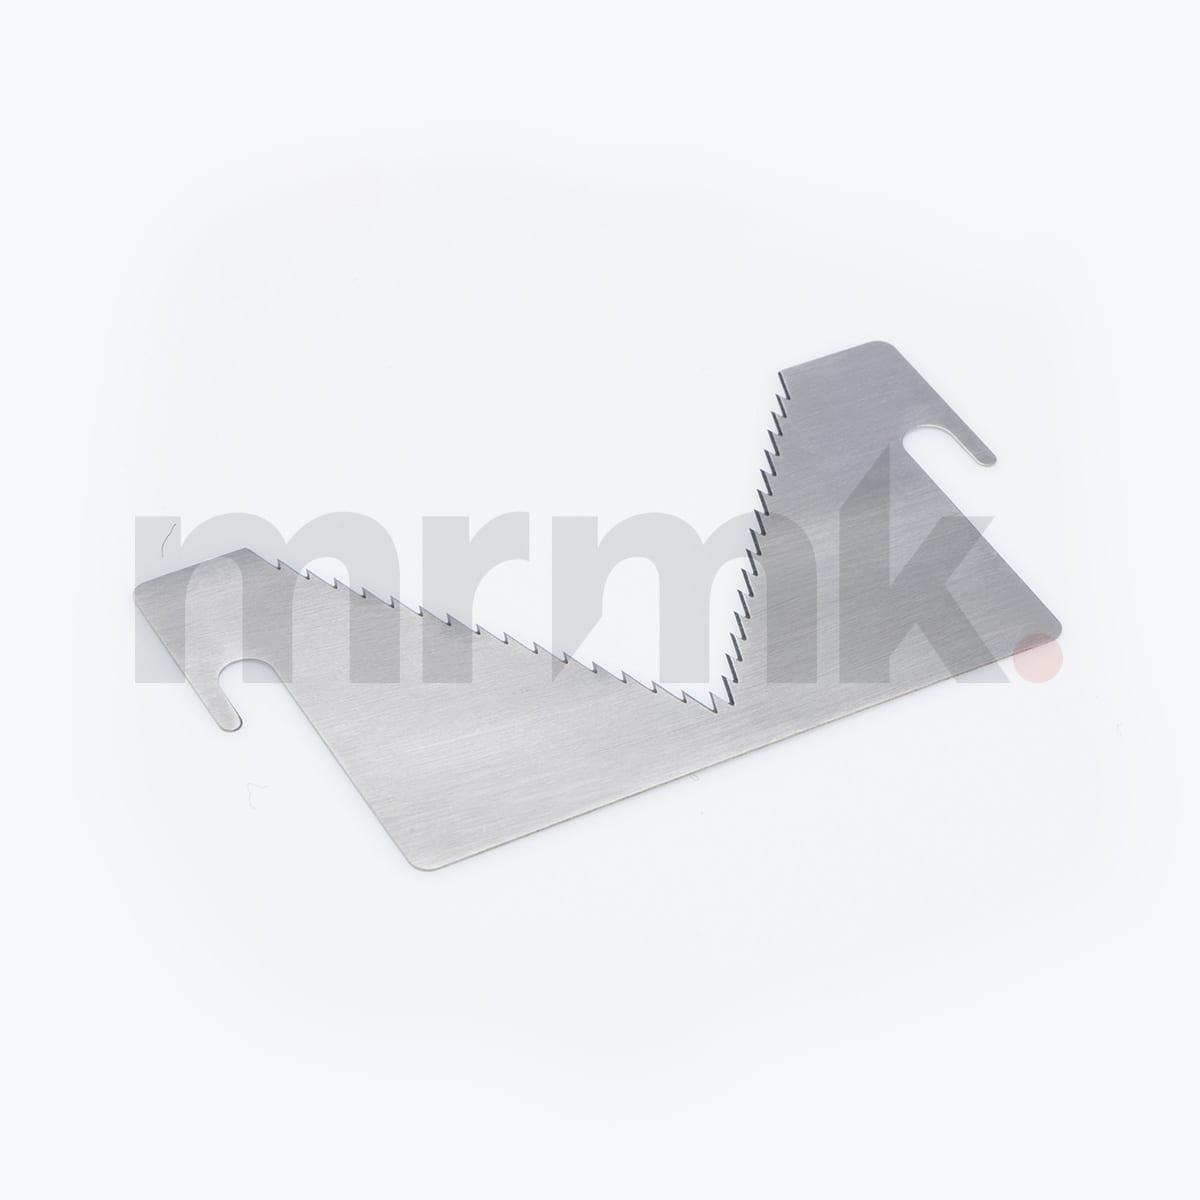 Kronen Cutter Compatible Blade 6